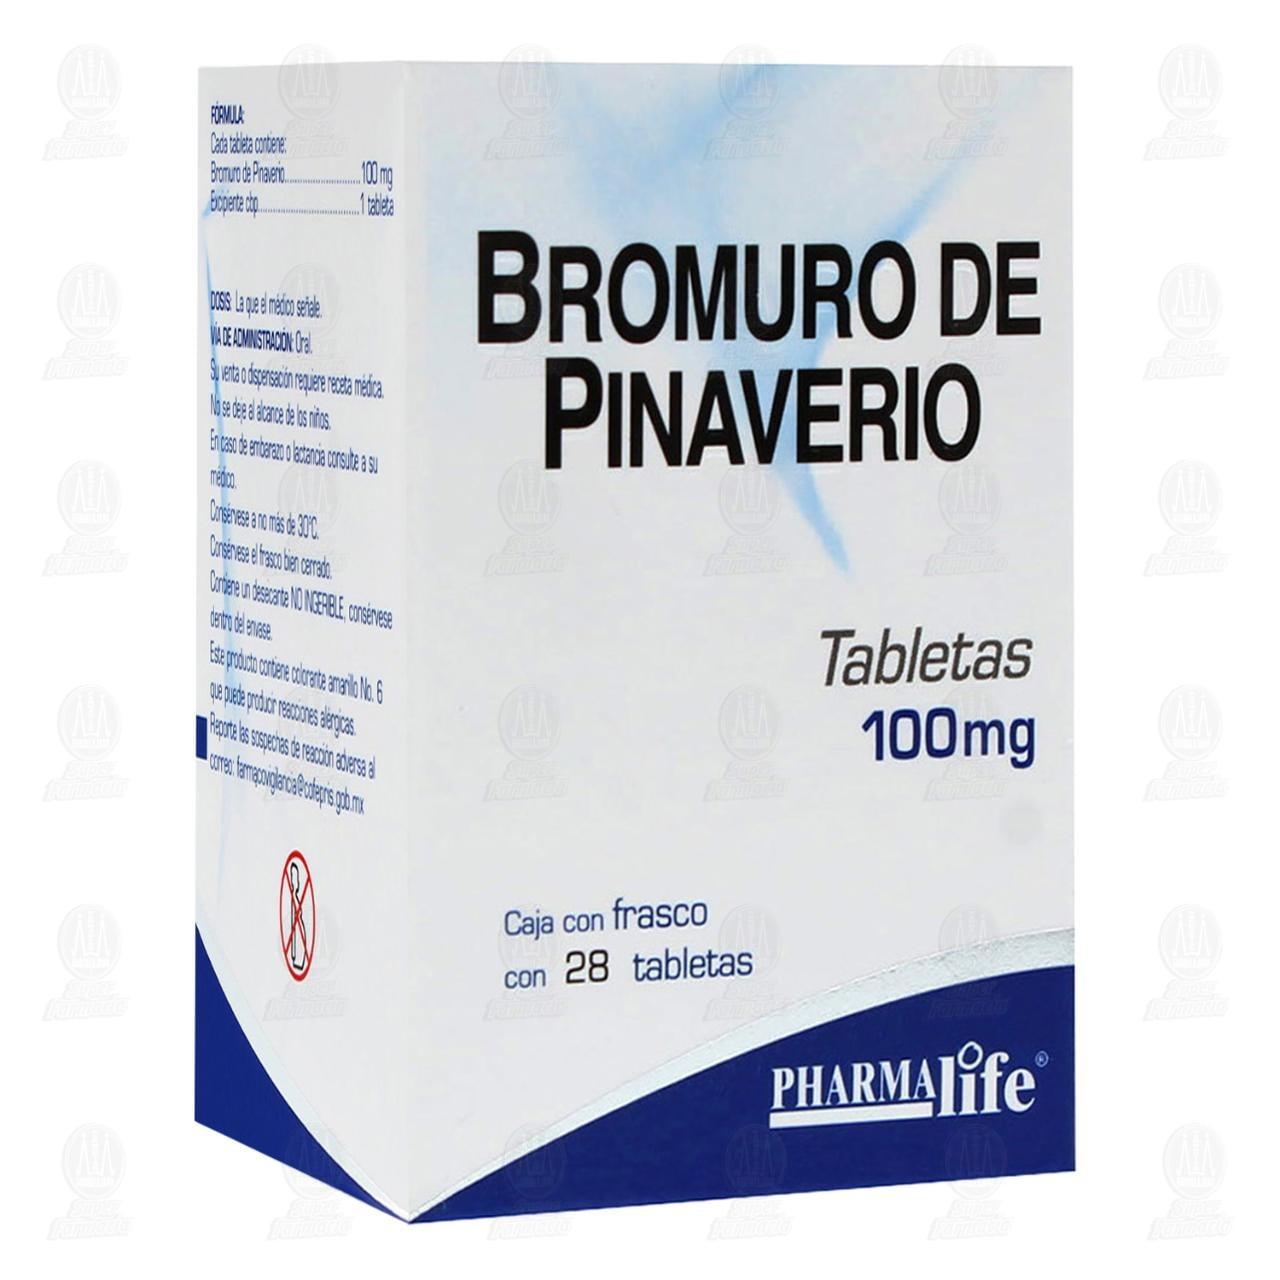 Comprar Bromuro Pinaverio 100mg 28 Tabletas Pharmalife en Farmacias Guadalajara